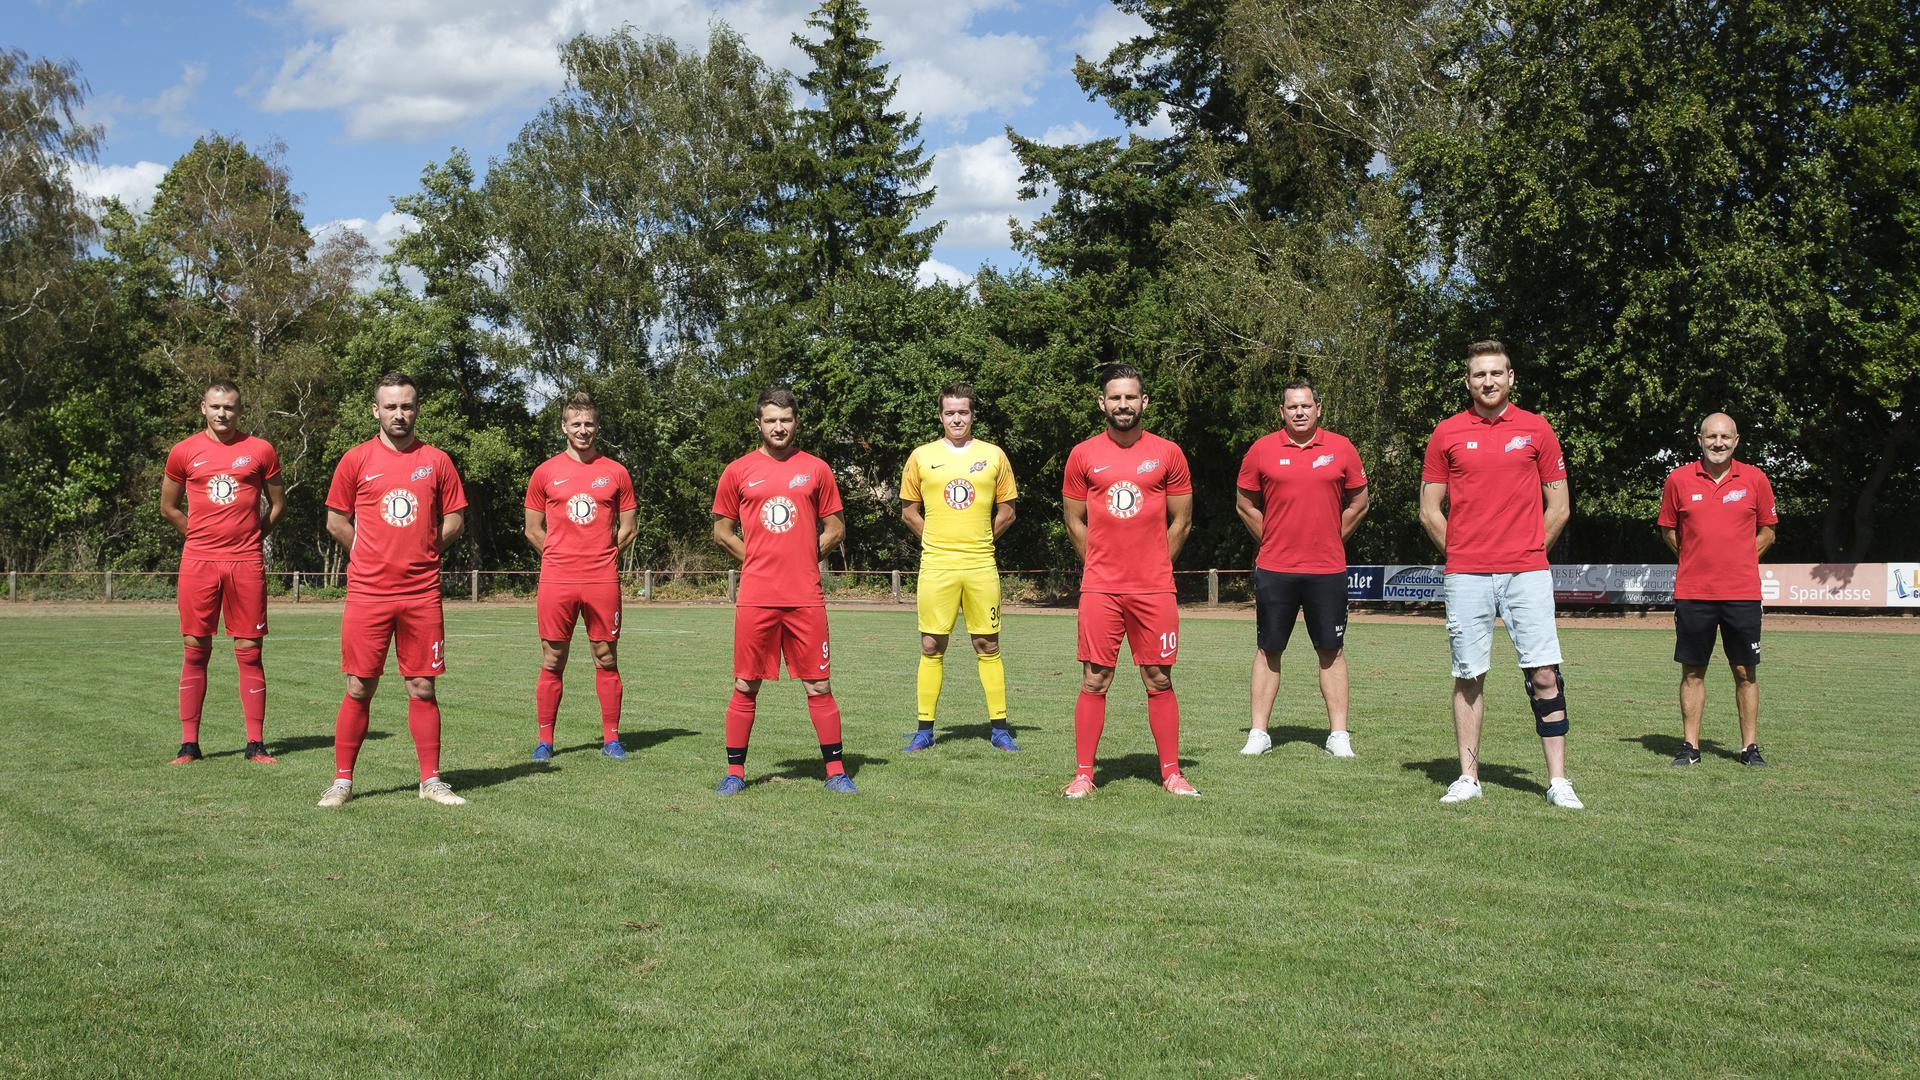 Neuzugaenge und Trainer des FC 07 Heidelsheim; im Bild (v.l.n.r.): Domagoj Popovic, Adam Filipovic, Ivan Greguric, Ivica Grigic, Leon Fehling, Tolga Soenmez, Markus Hoechstmann (Co-Trainer), Kevin Hertl, Milan Spoljar (Trainer).